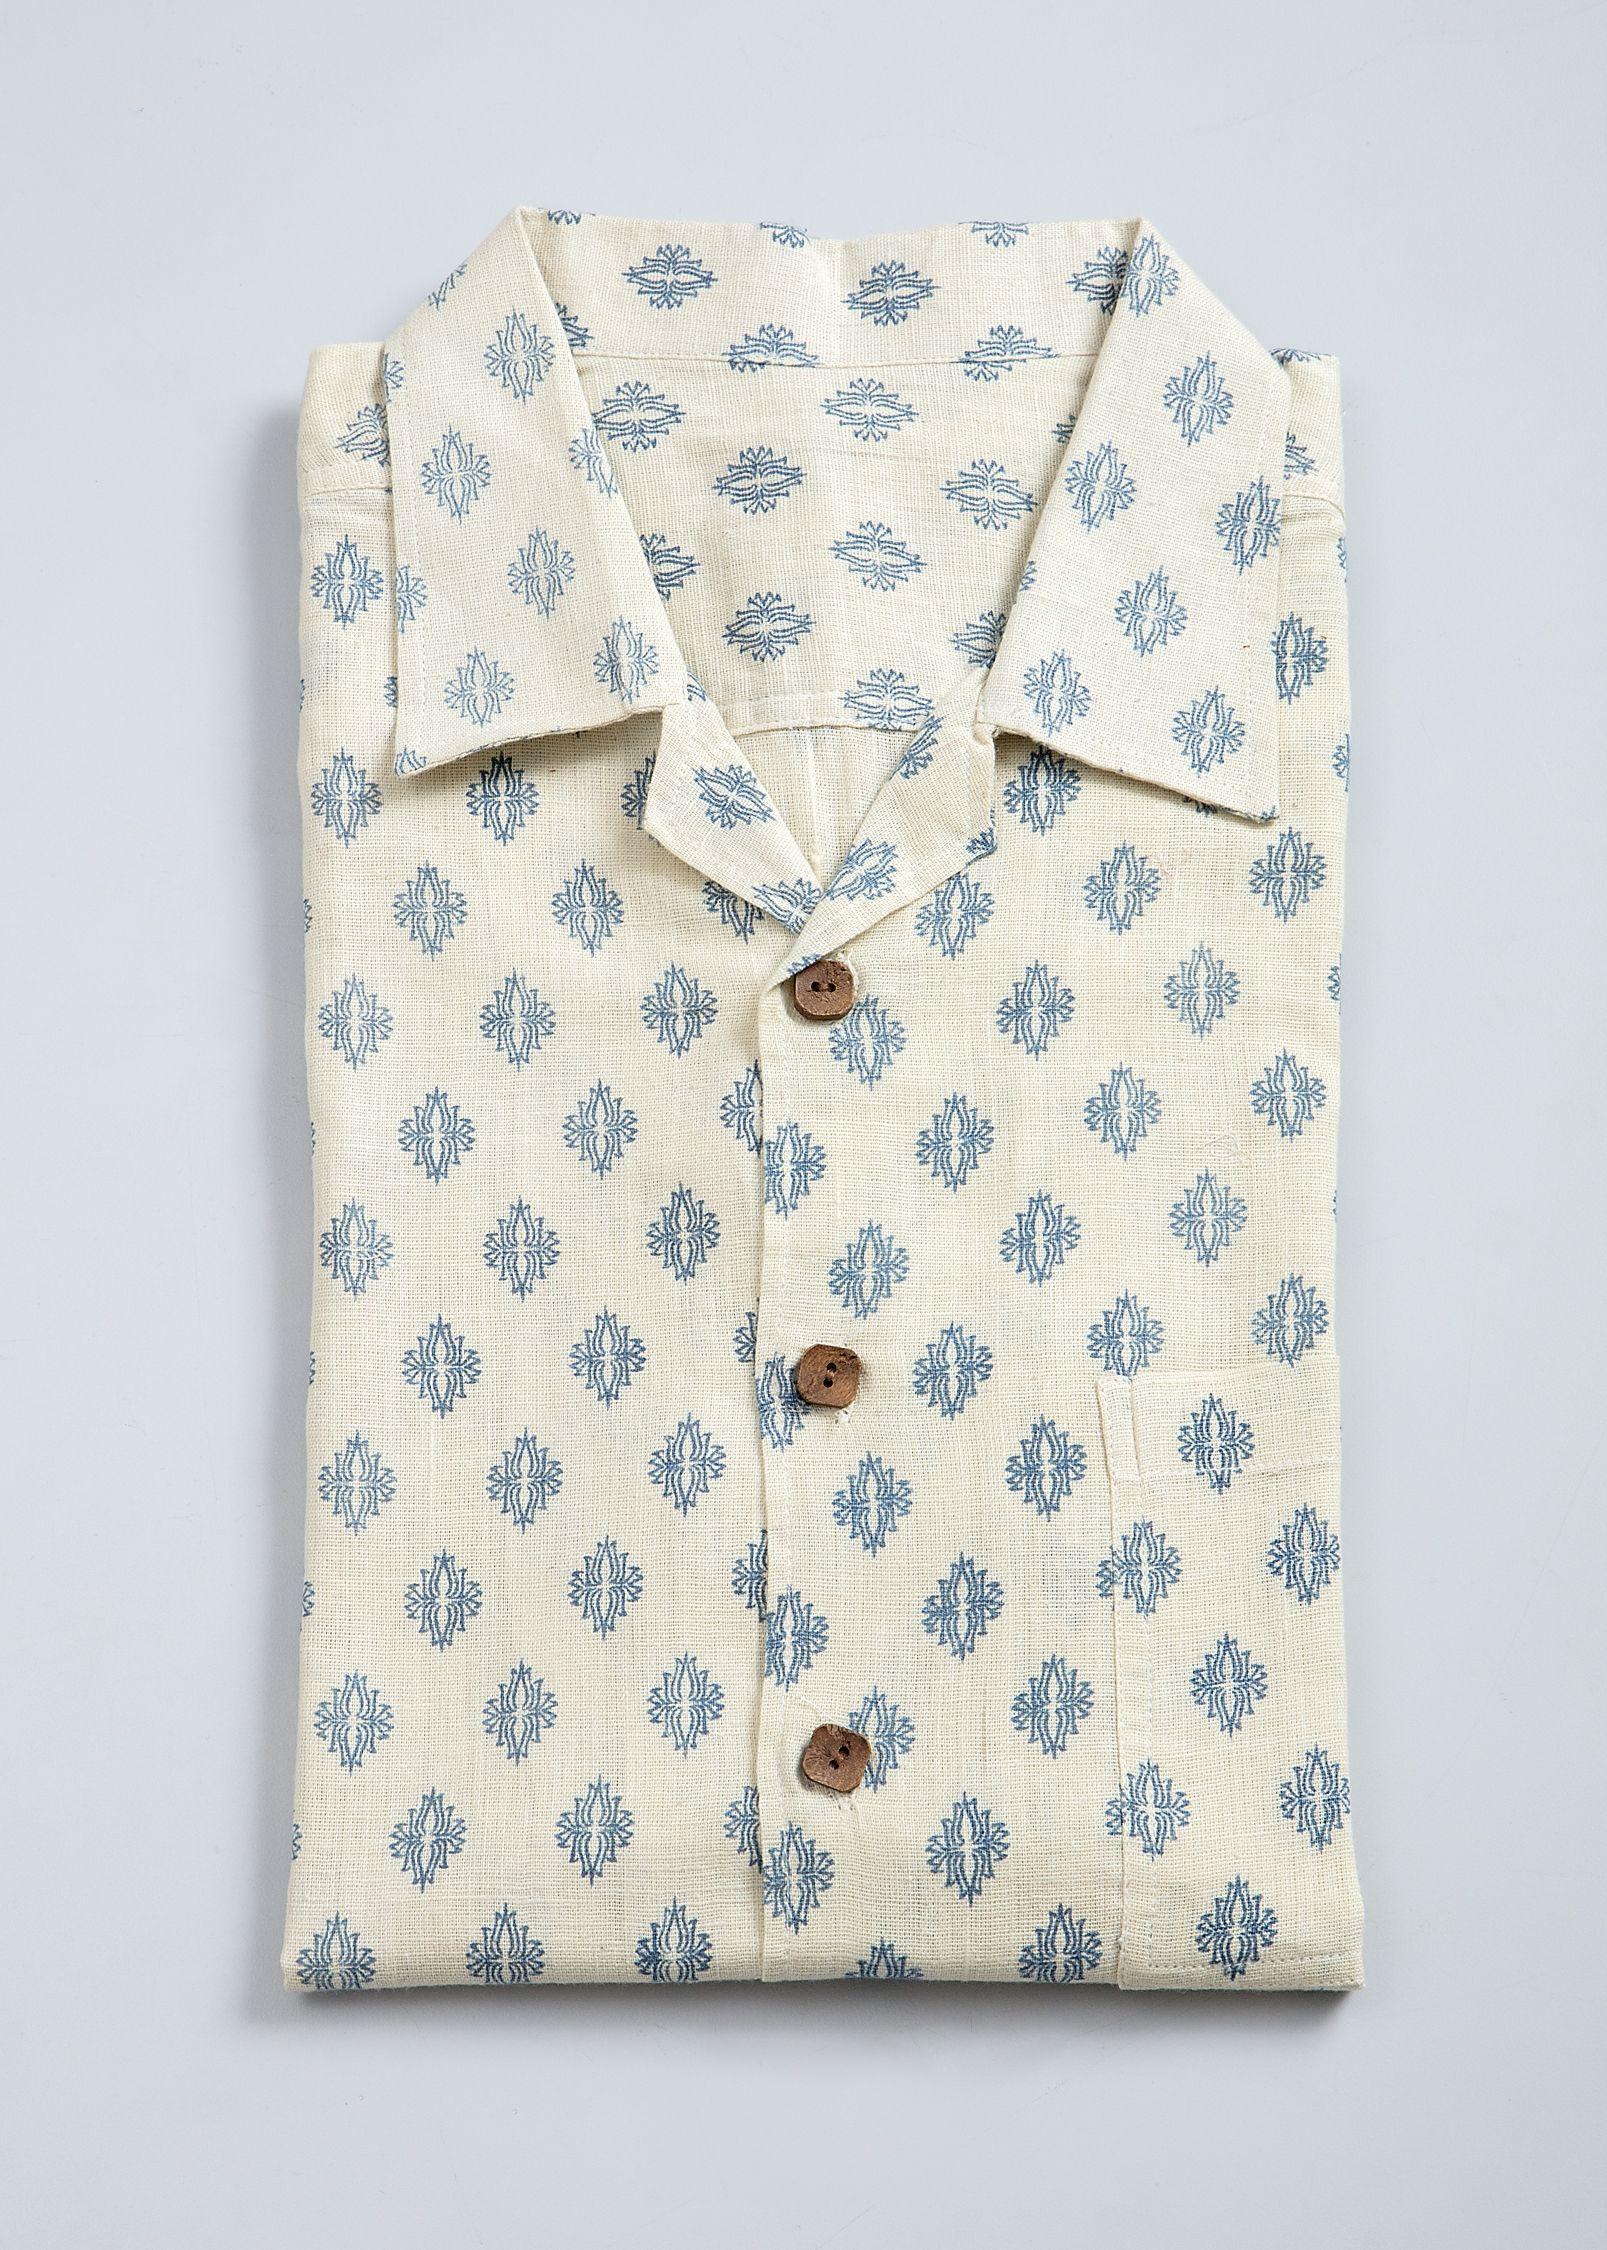 33c13d90 Natural dye, Indigo, block print, kadhi, Men's shirt, with square wooden  buttons